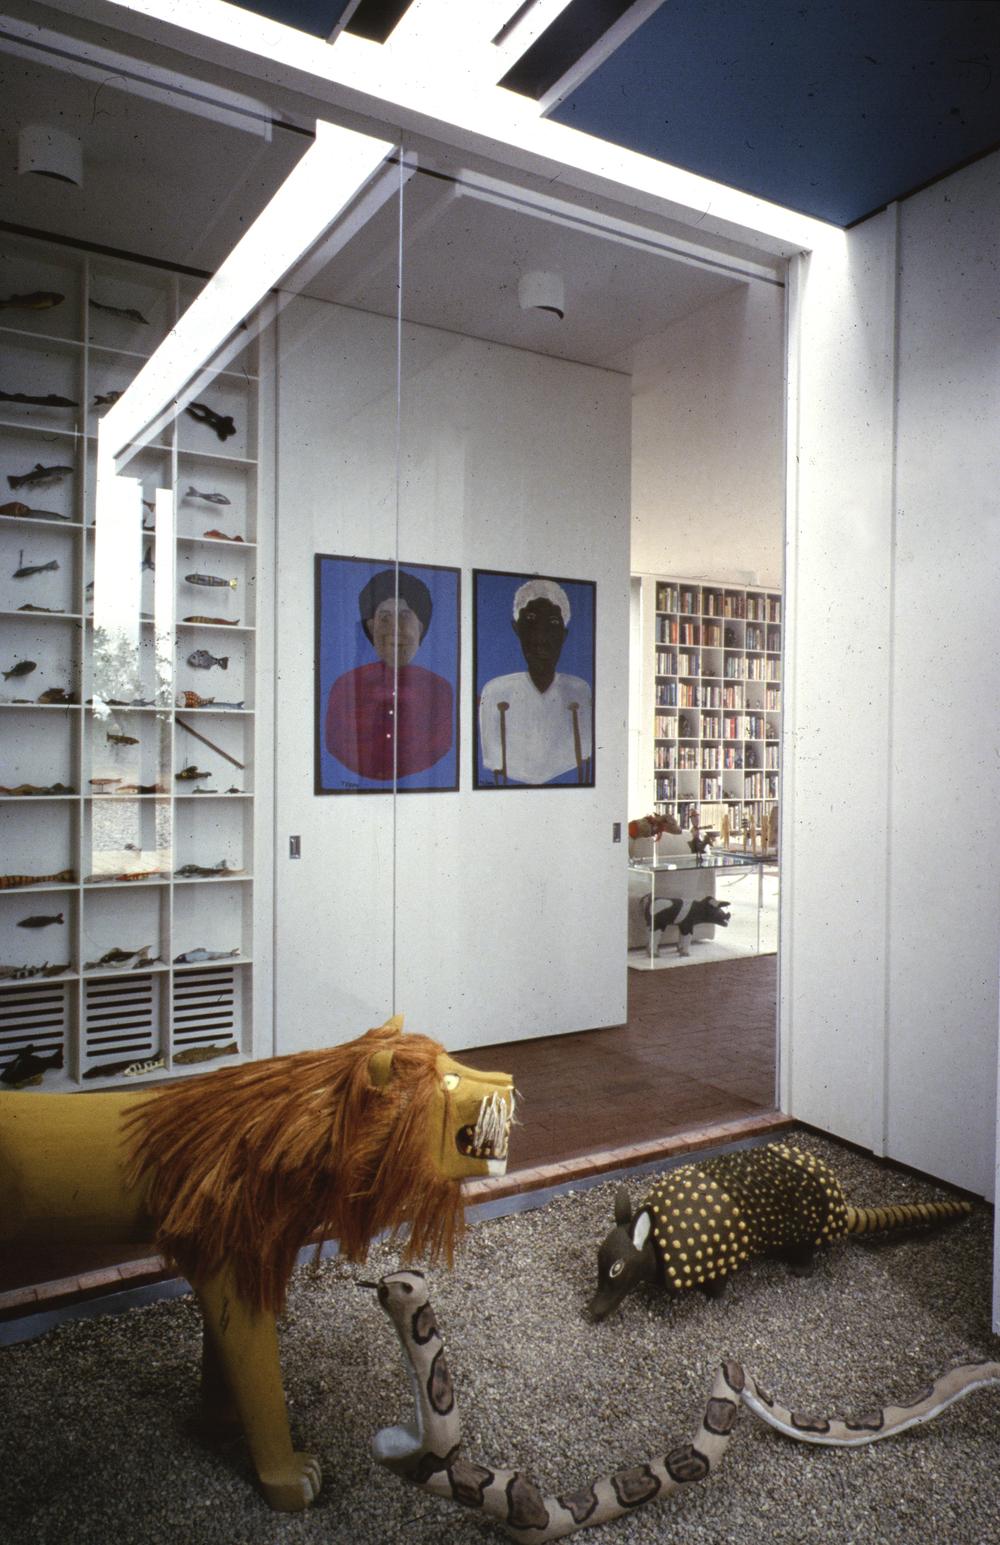 Rosenak Gallery